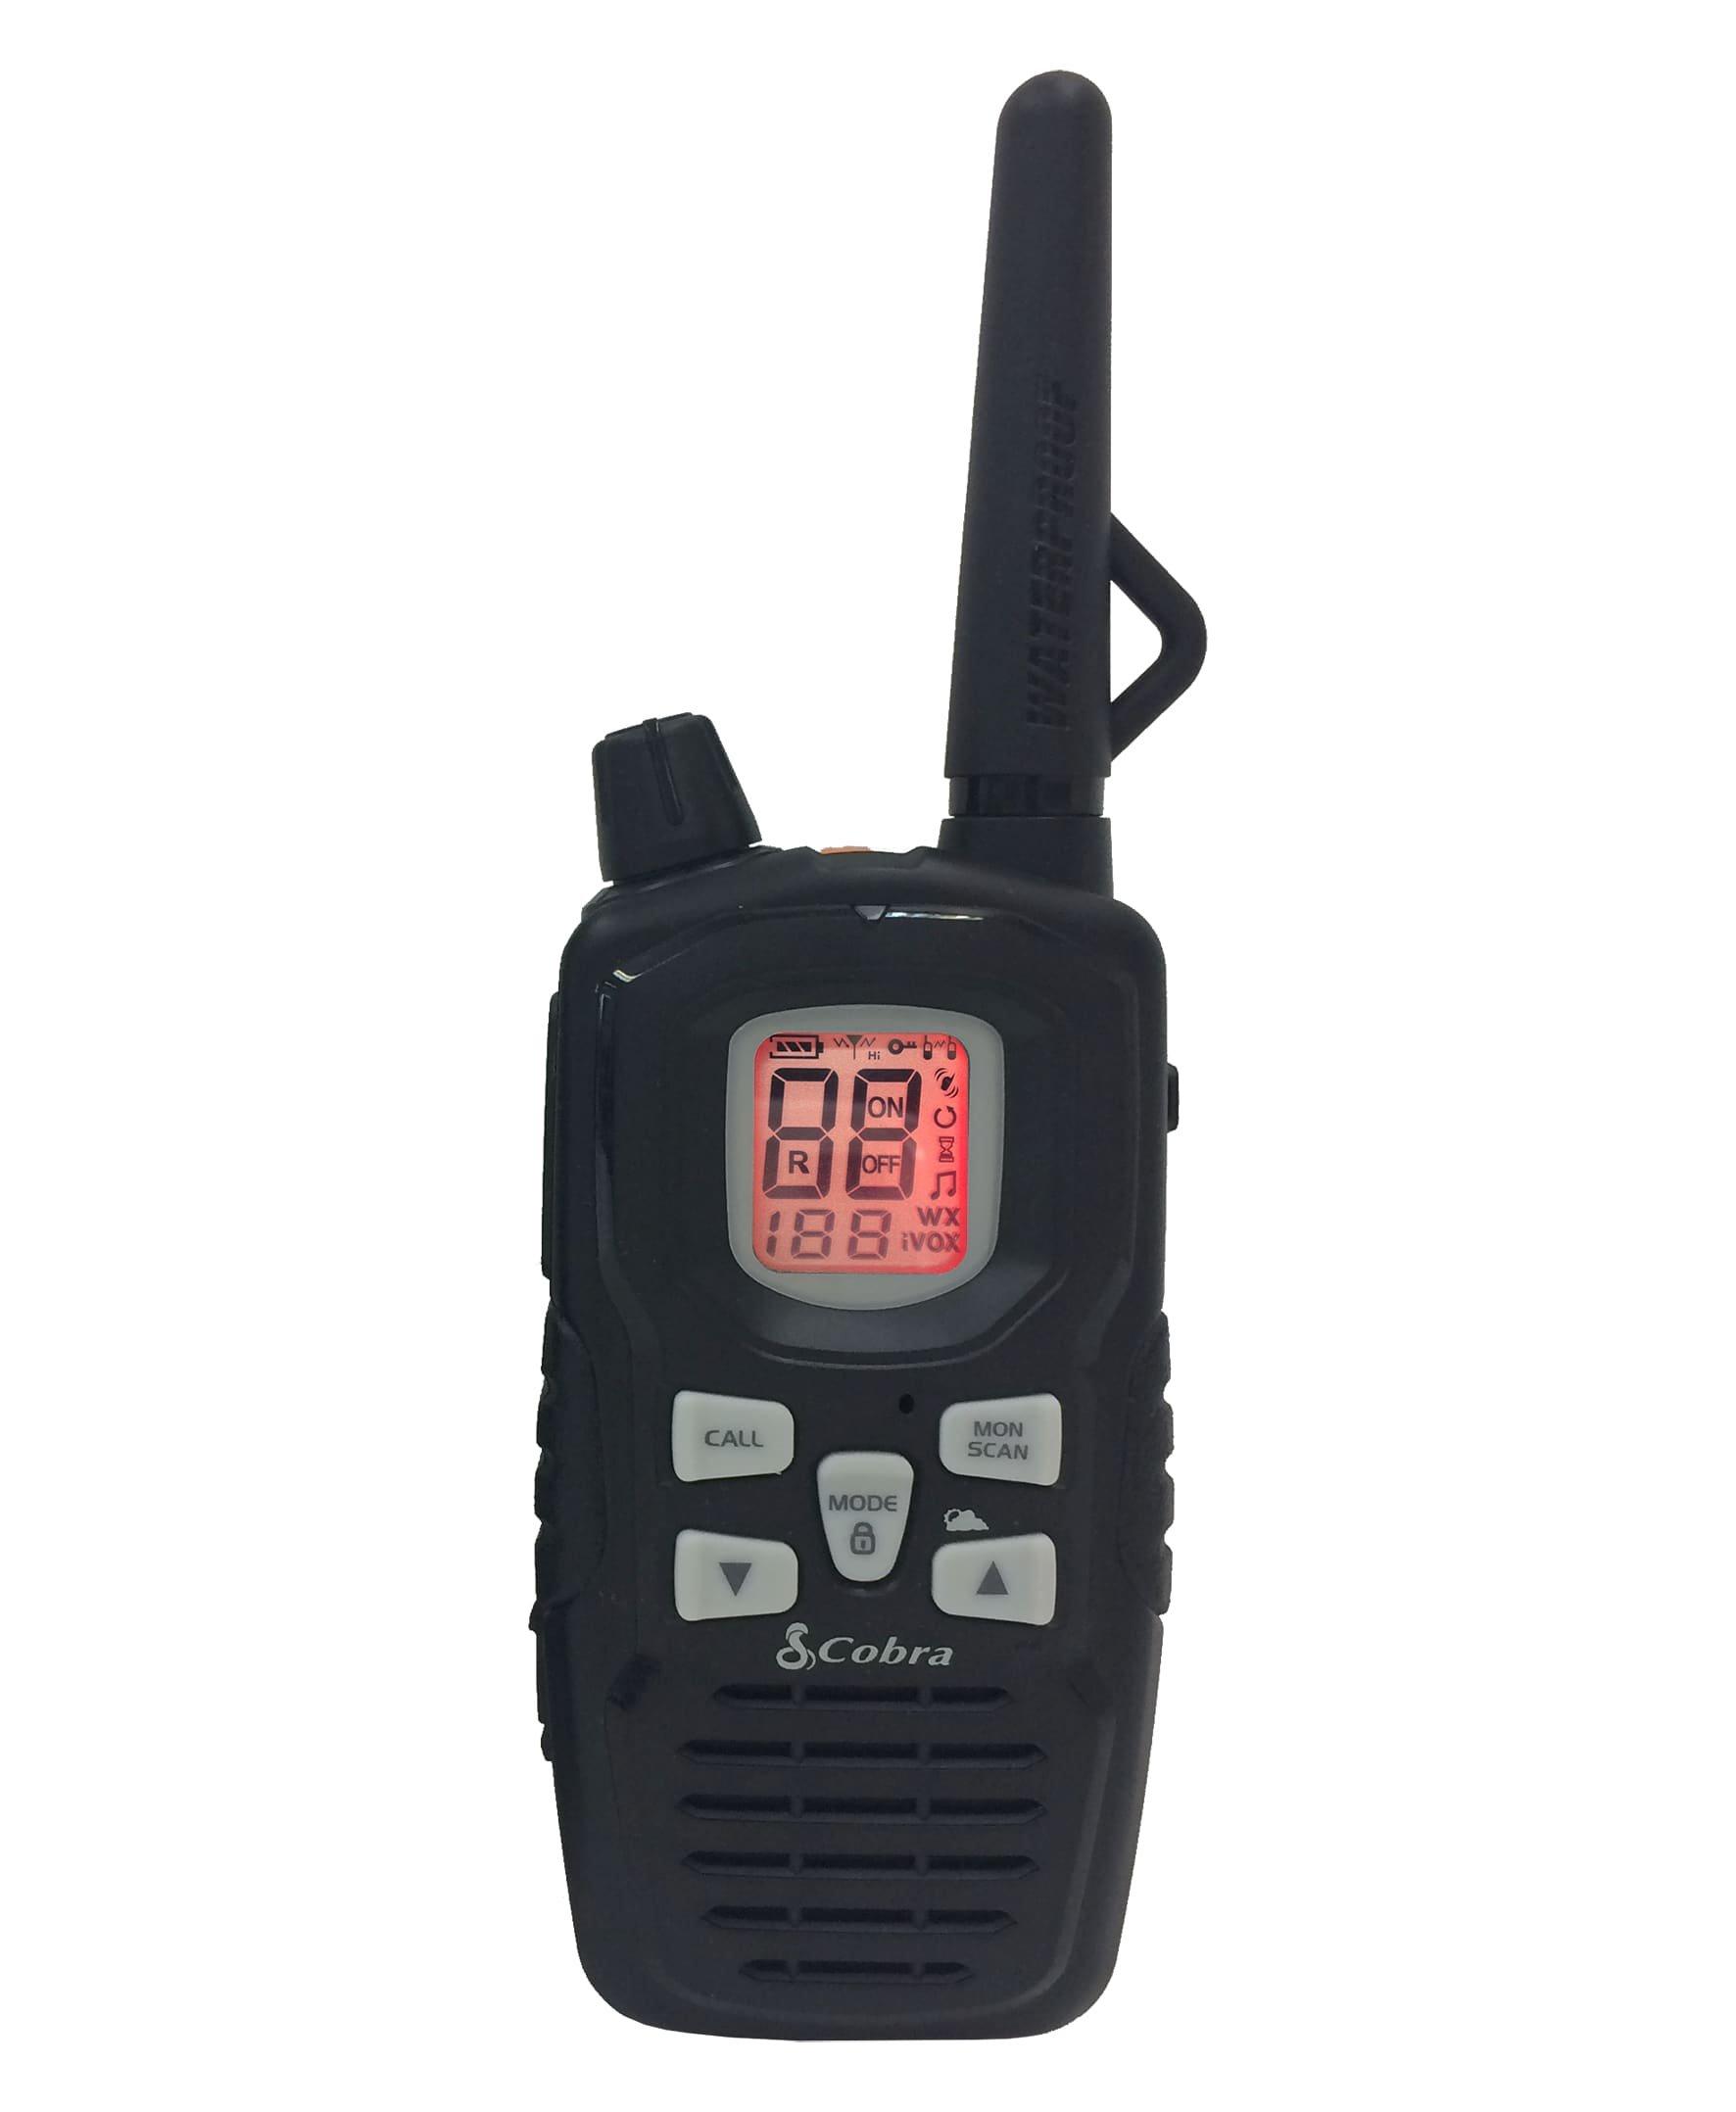 Cobra CXY900 Walkie Talkies 40-Mile Two-Way Radios, Rechargeable (Pair) by Cobra (Image #5)